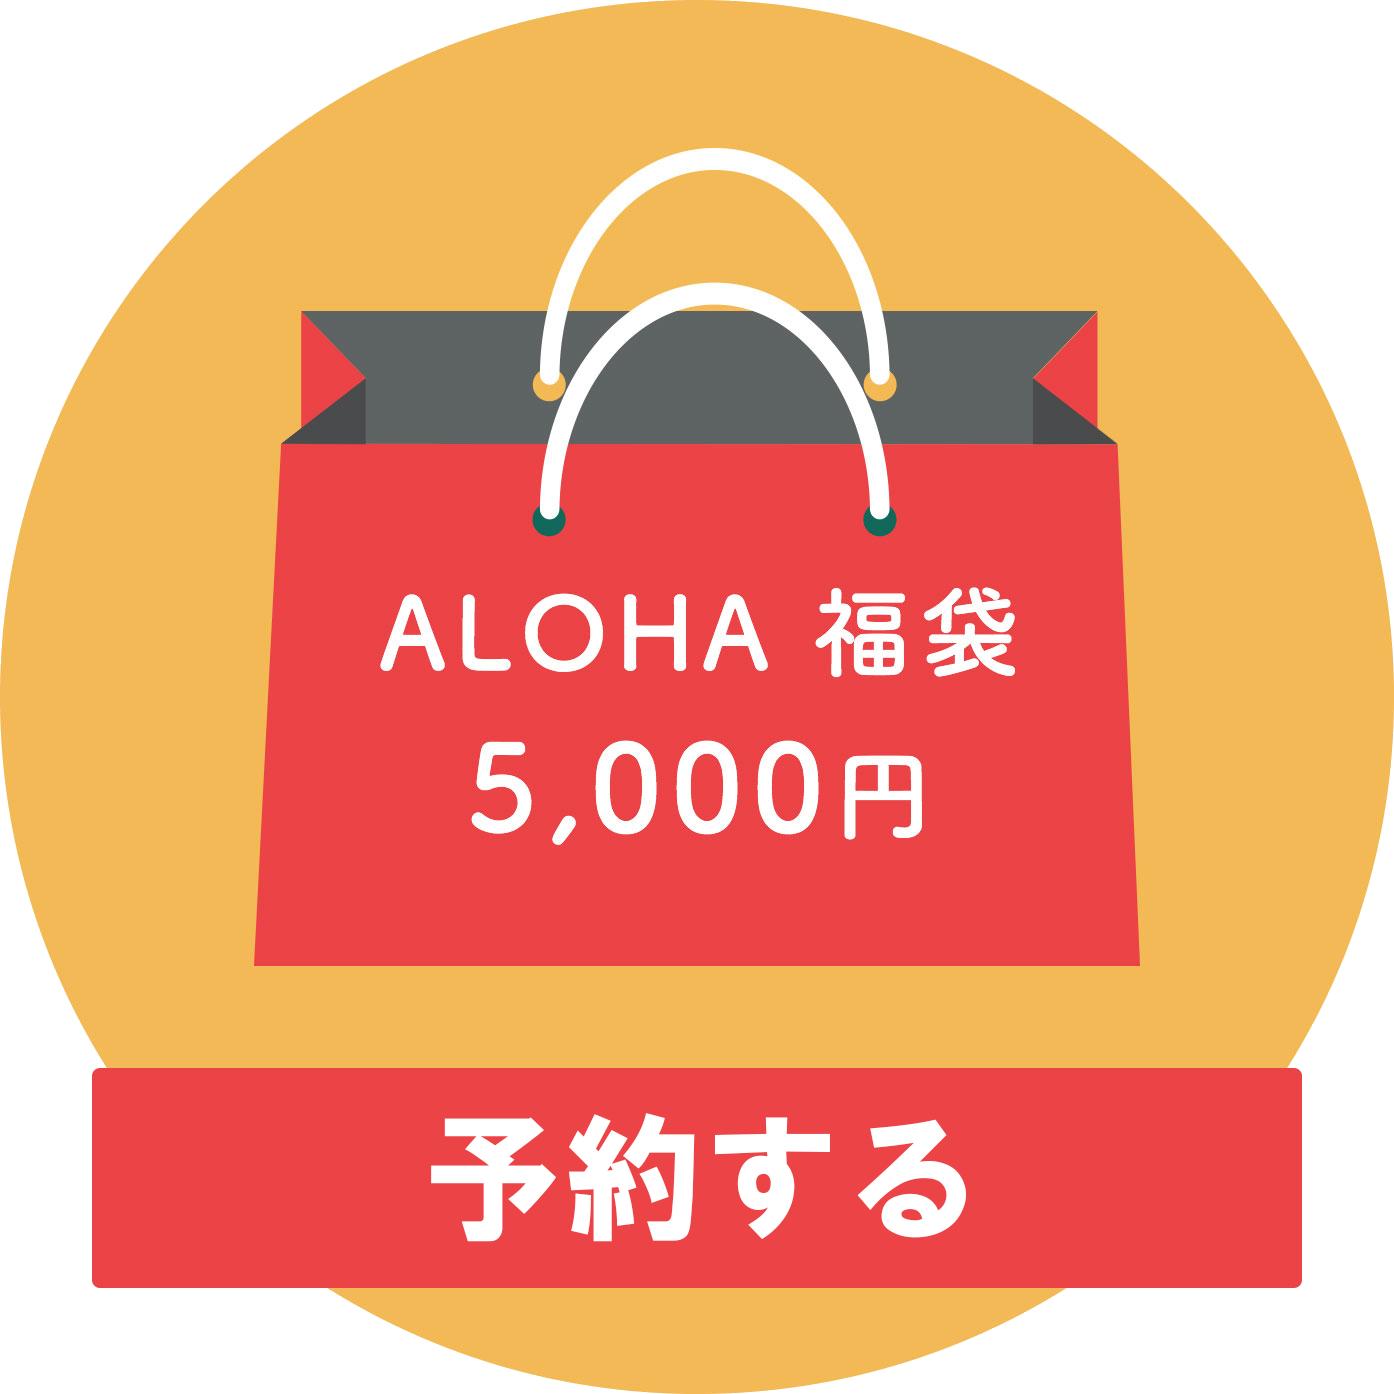 ALOHA福袋 5000円 ご購入はこちら